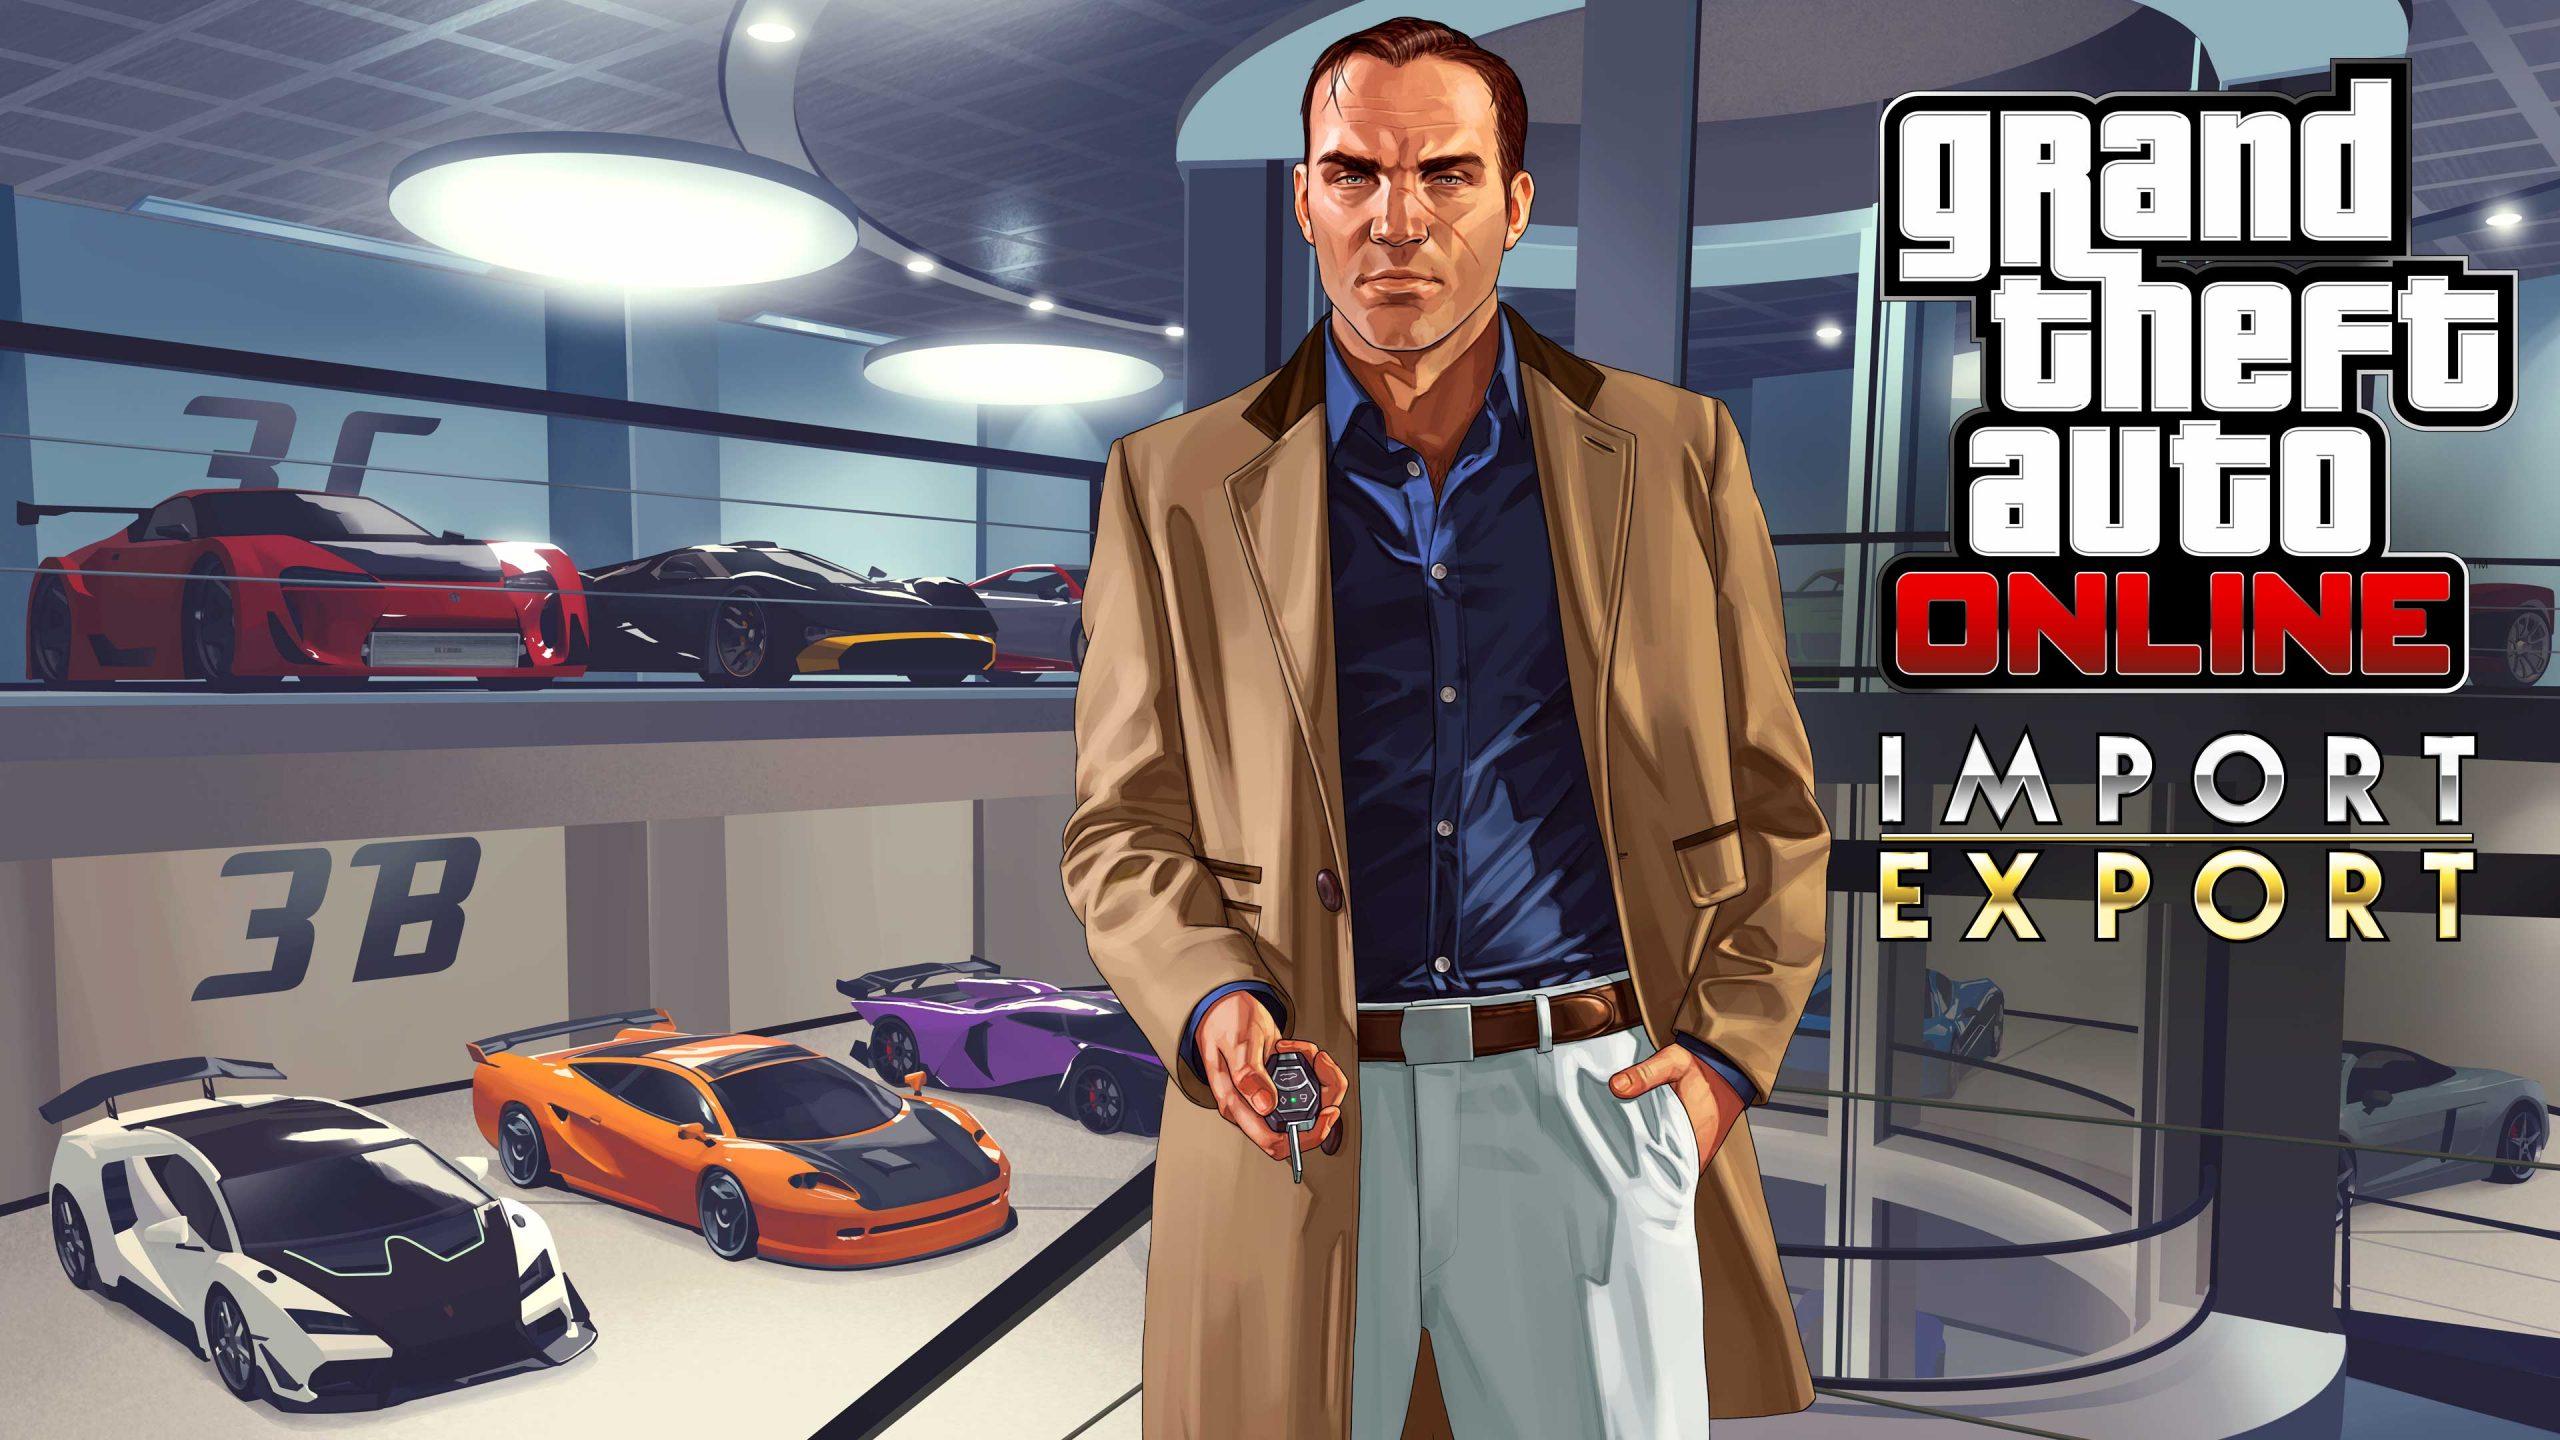 semaine-import-export GTA Online